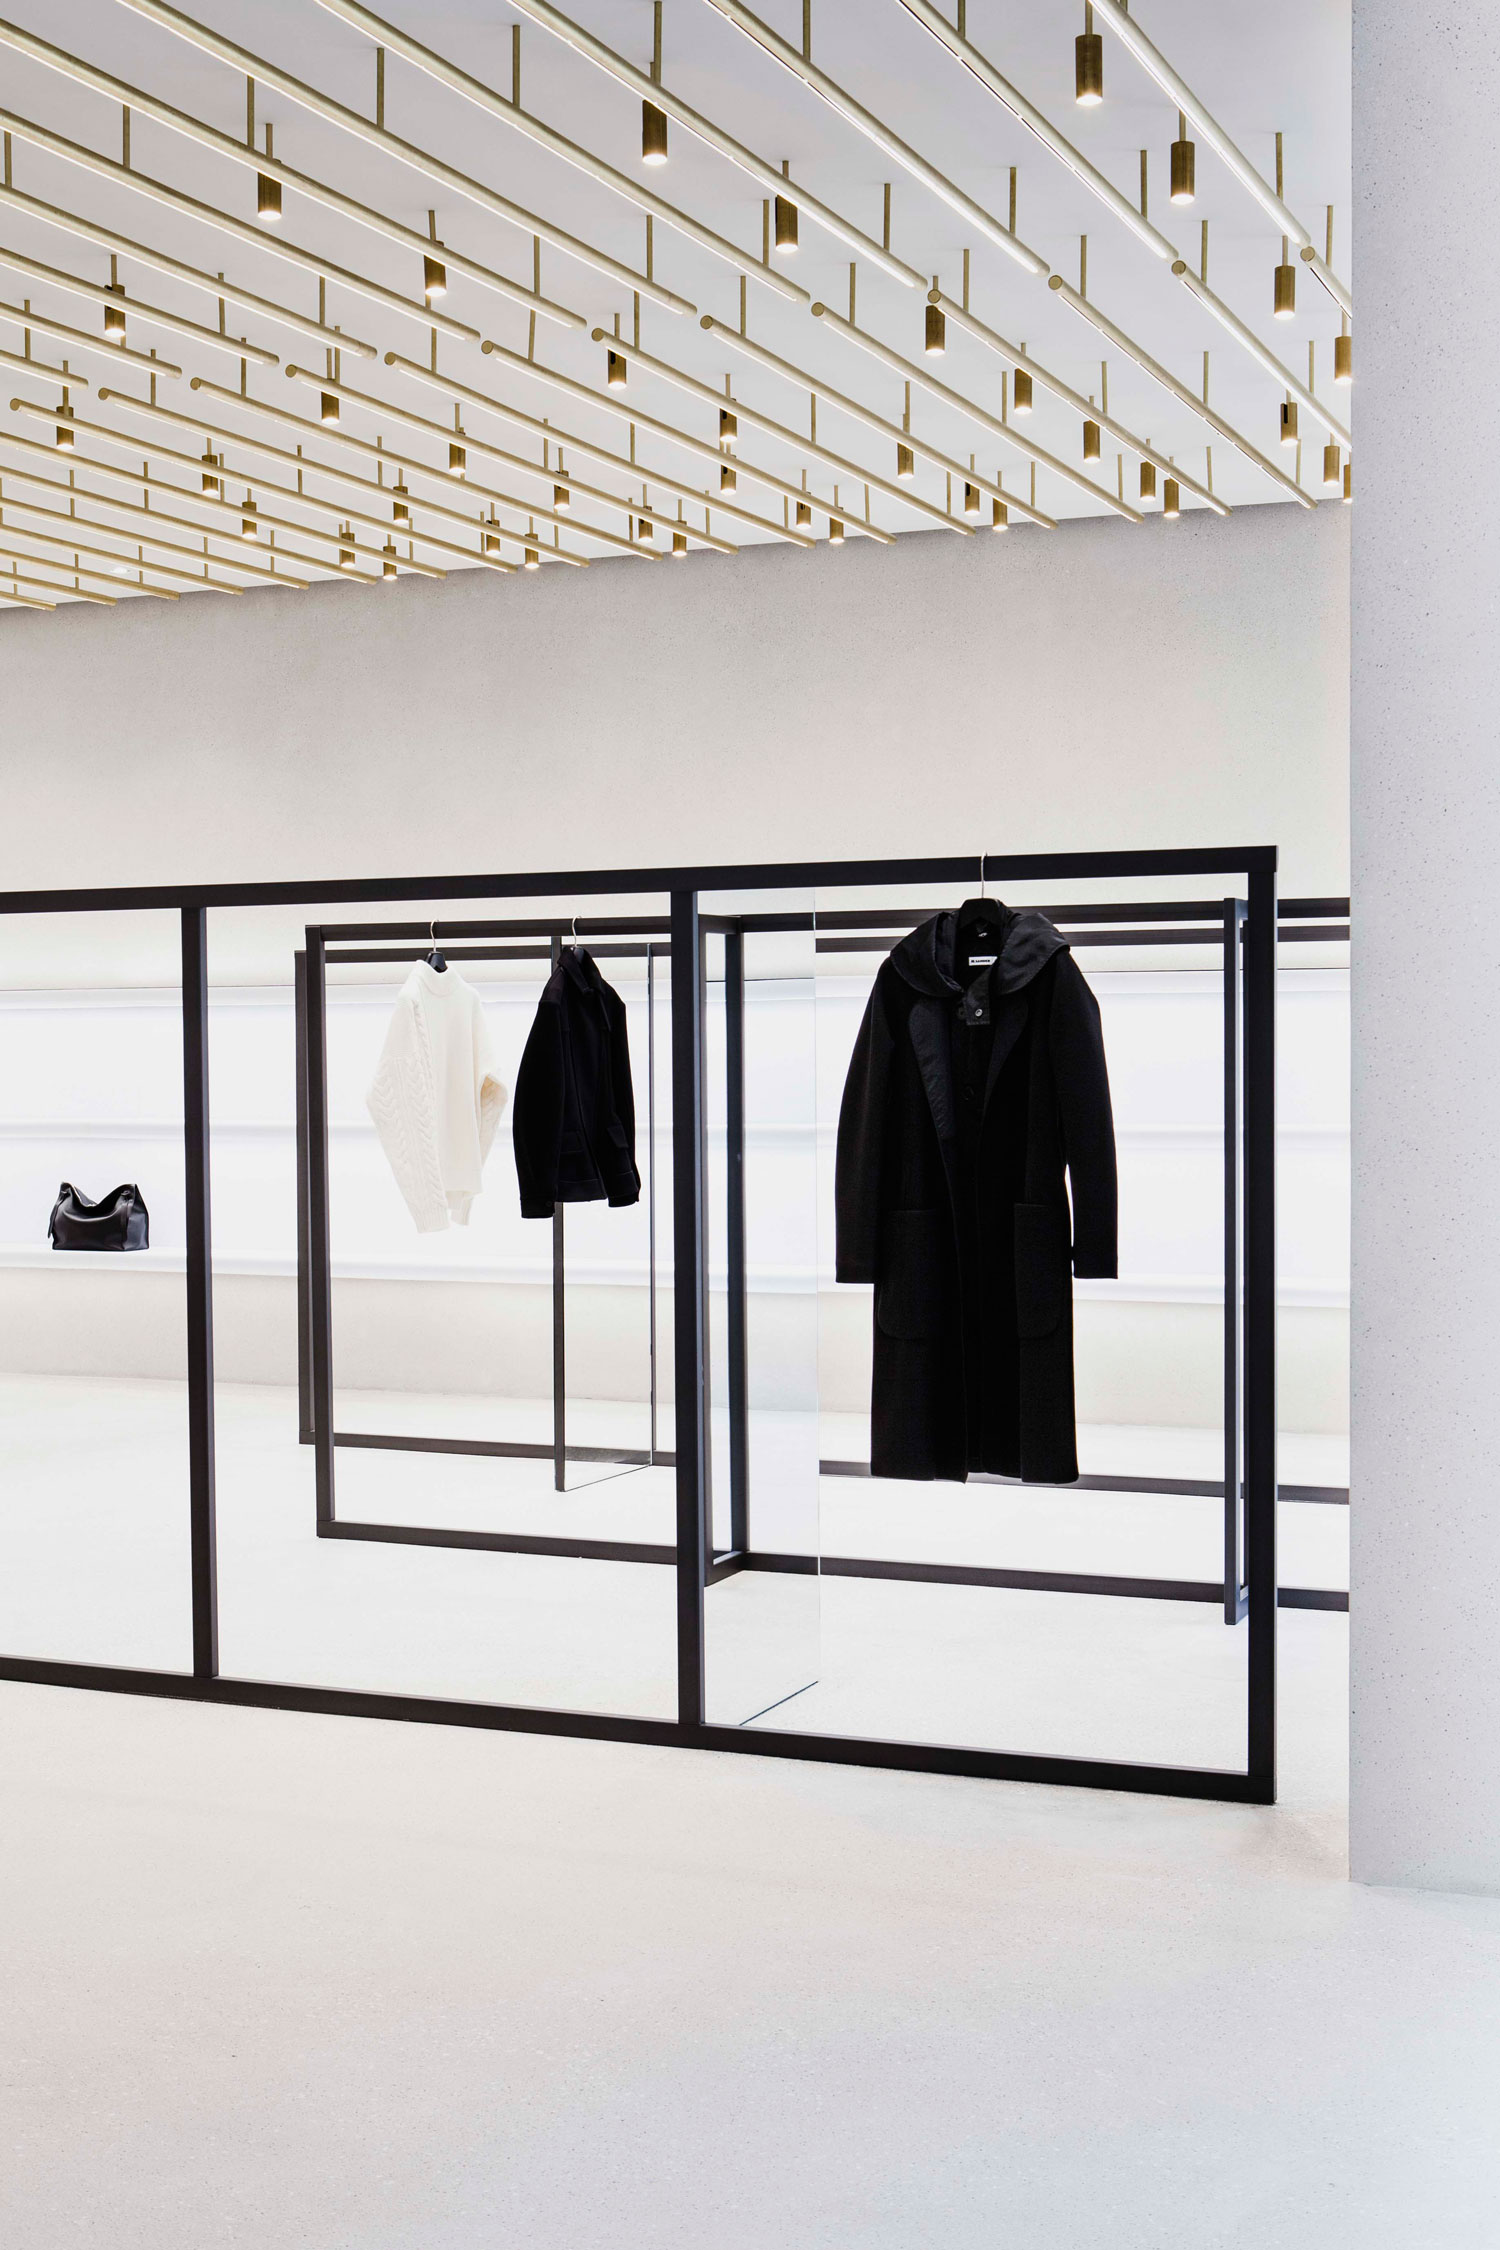 Jil sander berlin store by andrea tognon architecture for Design shop berlin